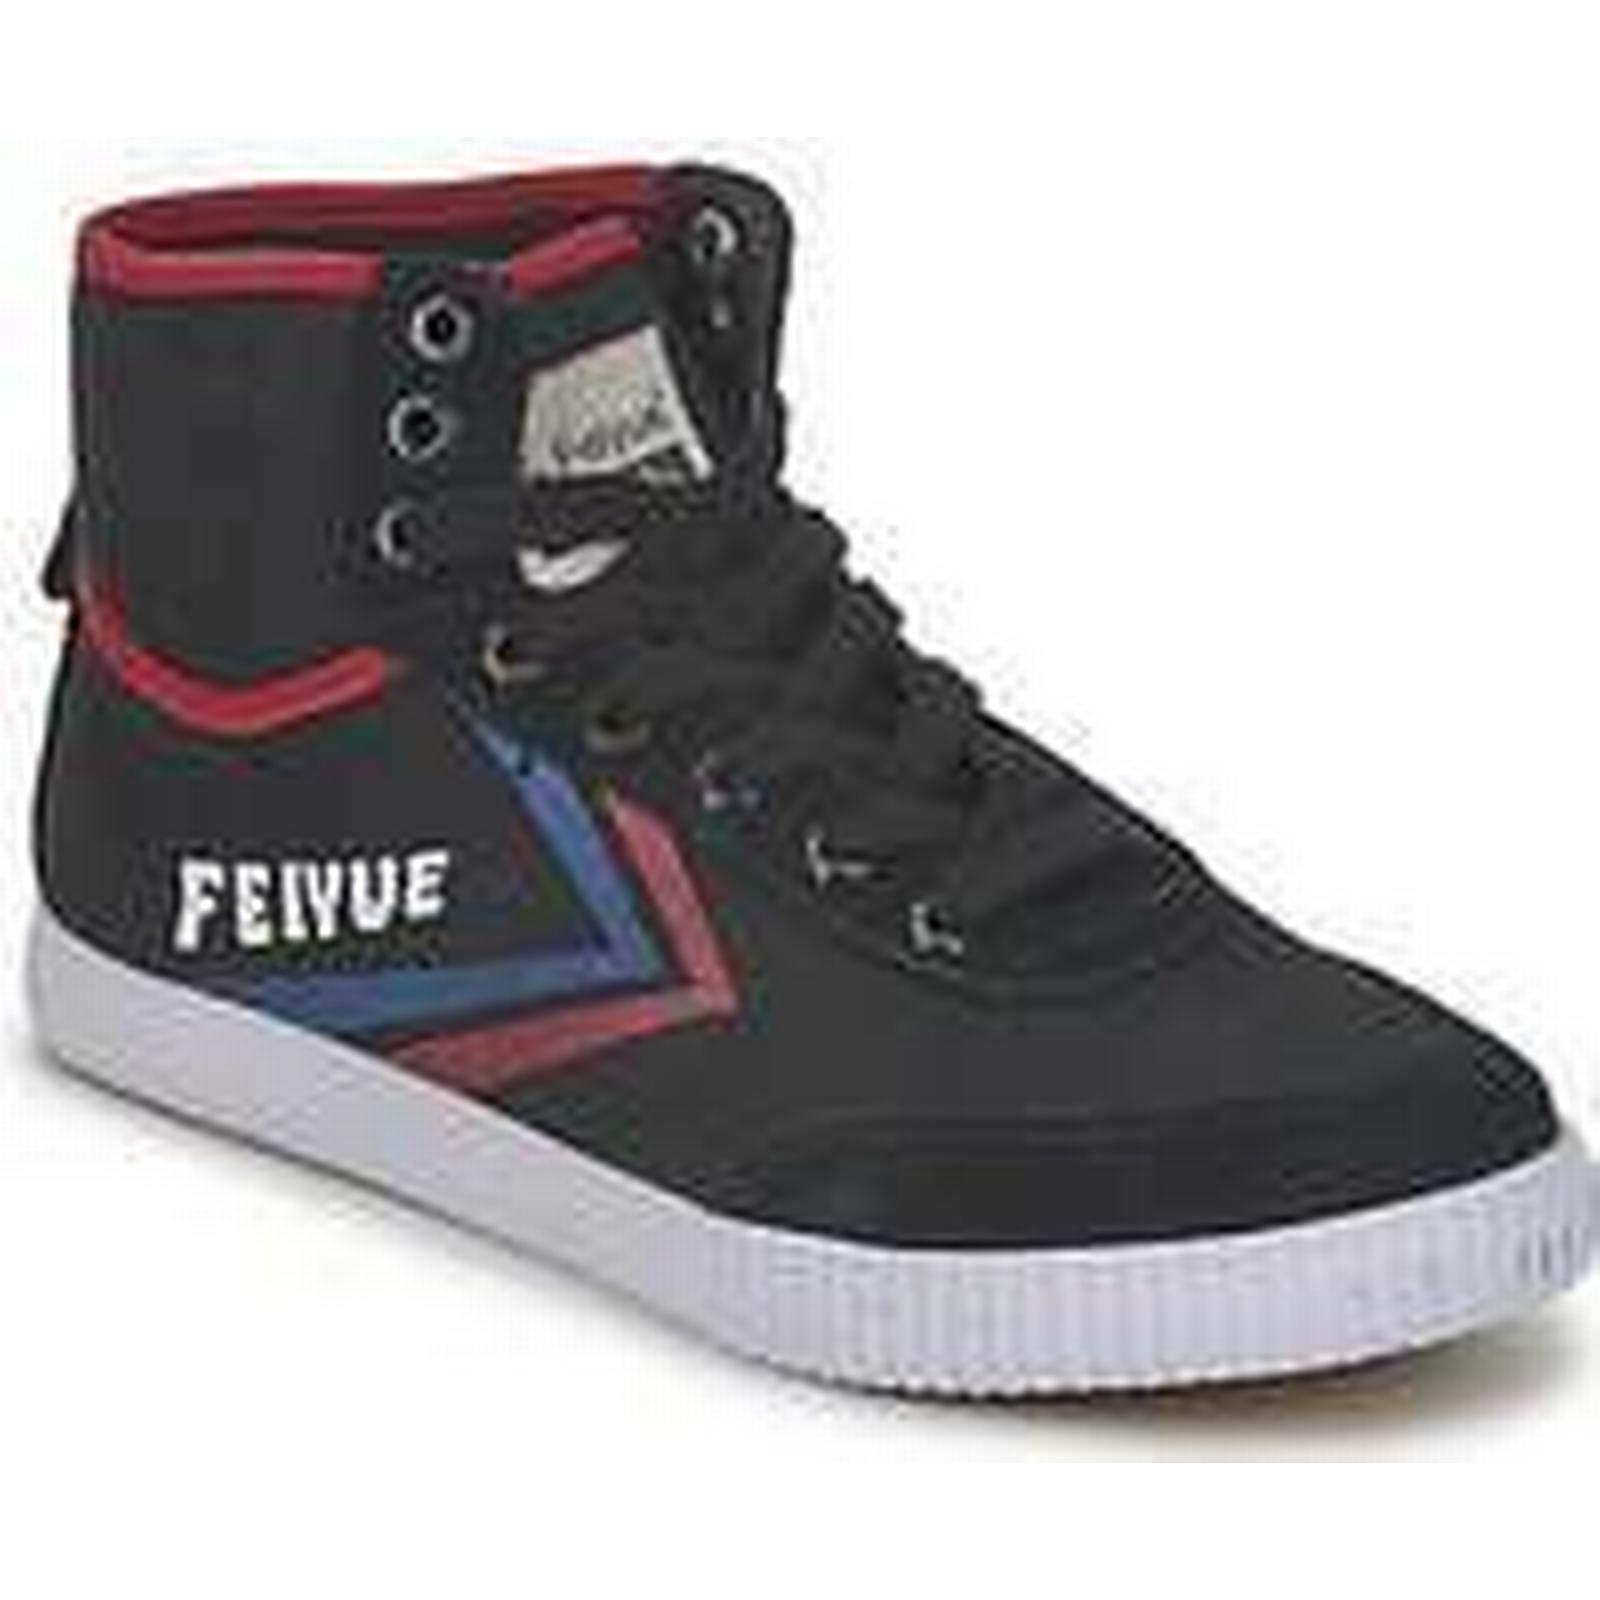 Spartoo.co.uk Feiyue A.S HIGH ORIGINE Trainers) 1920 men's Shoes (High-top Trainers) ORIGINE in Black e67bf3